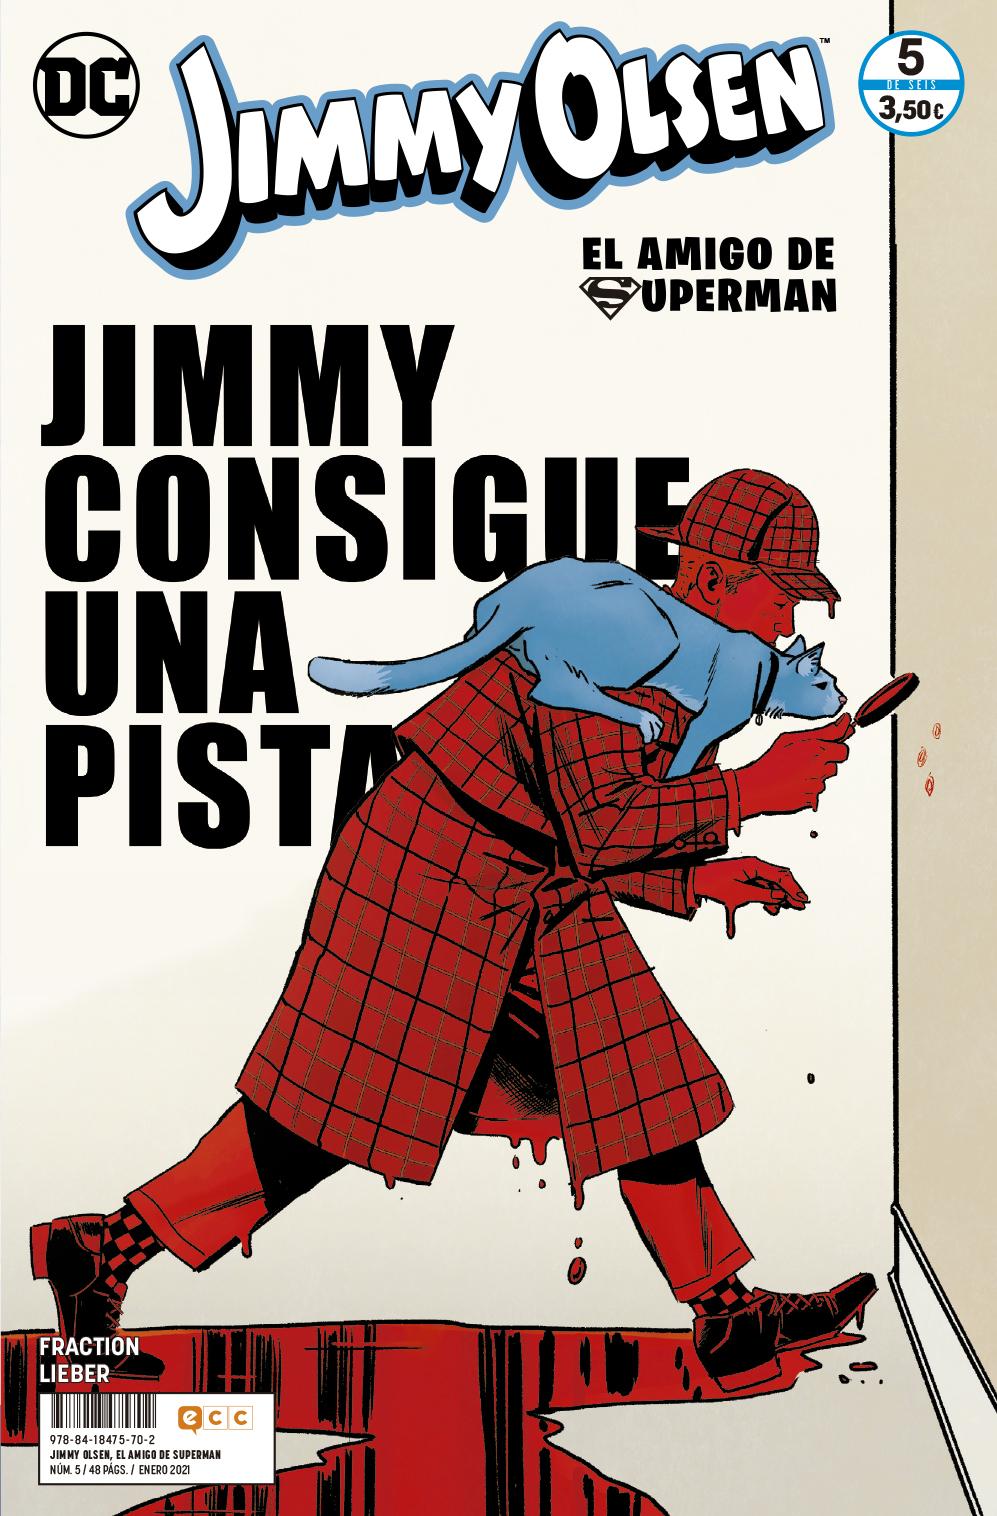 Jimmy Olsen, el amigo de Superman núm. 05 de 6